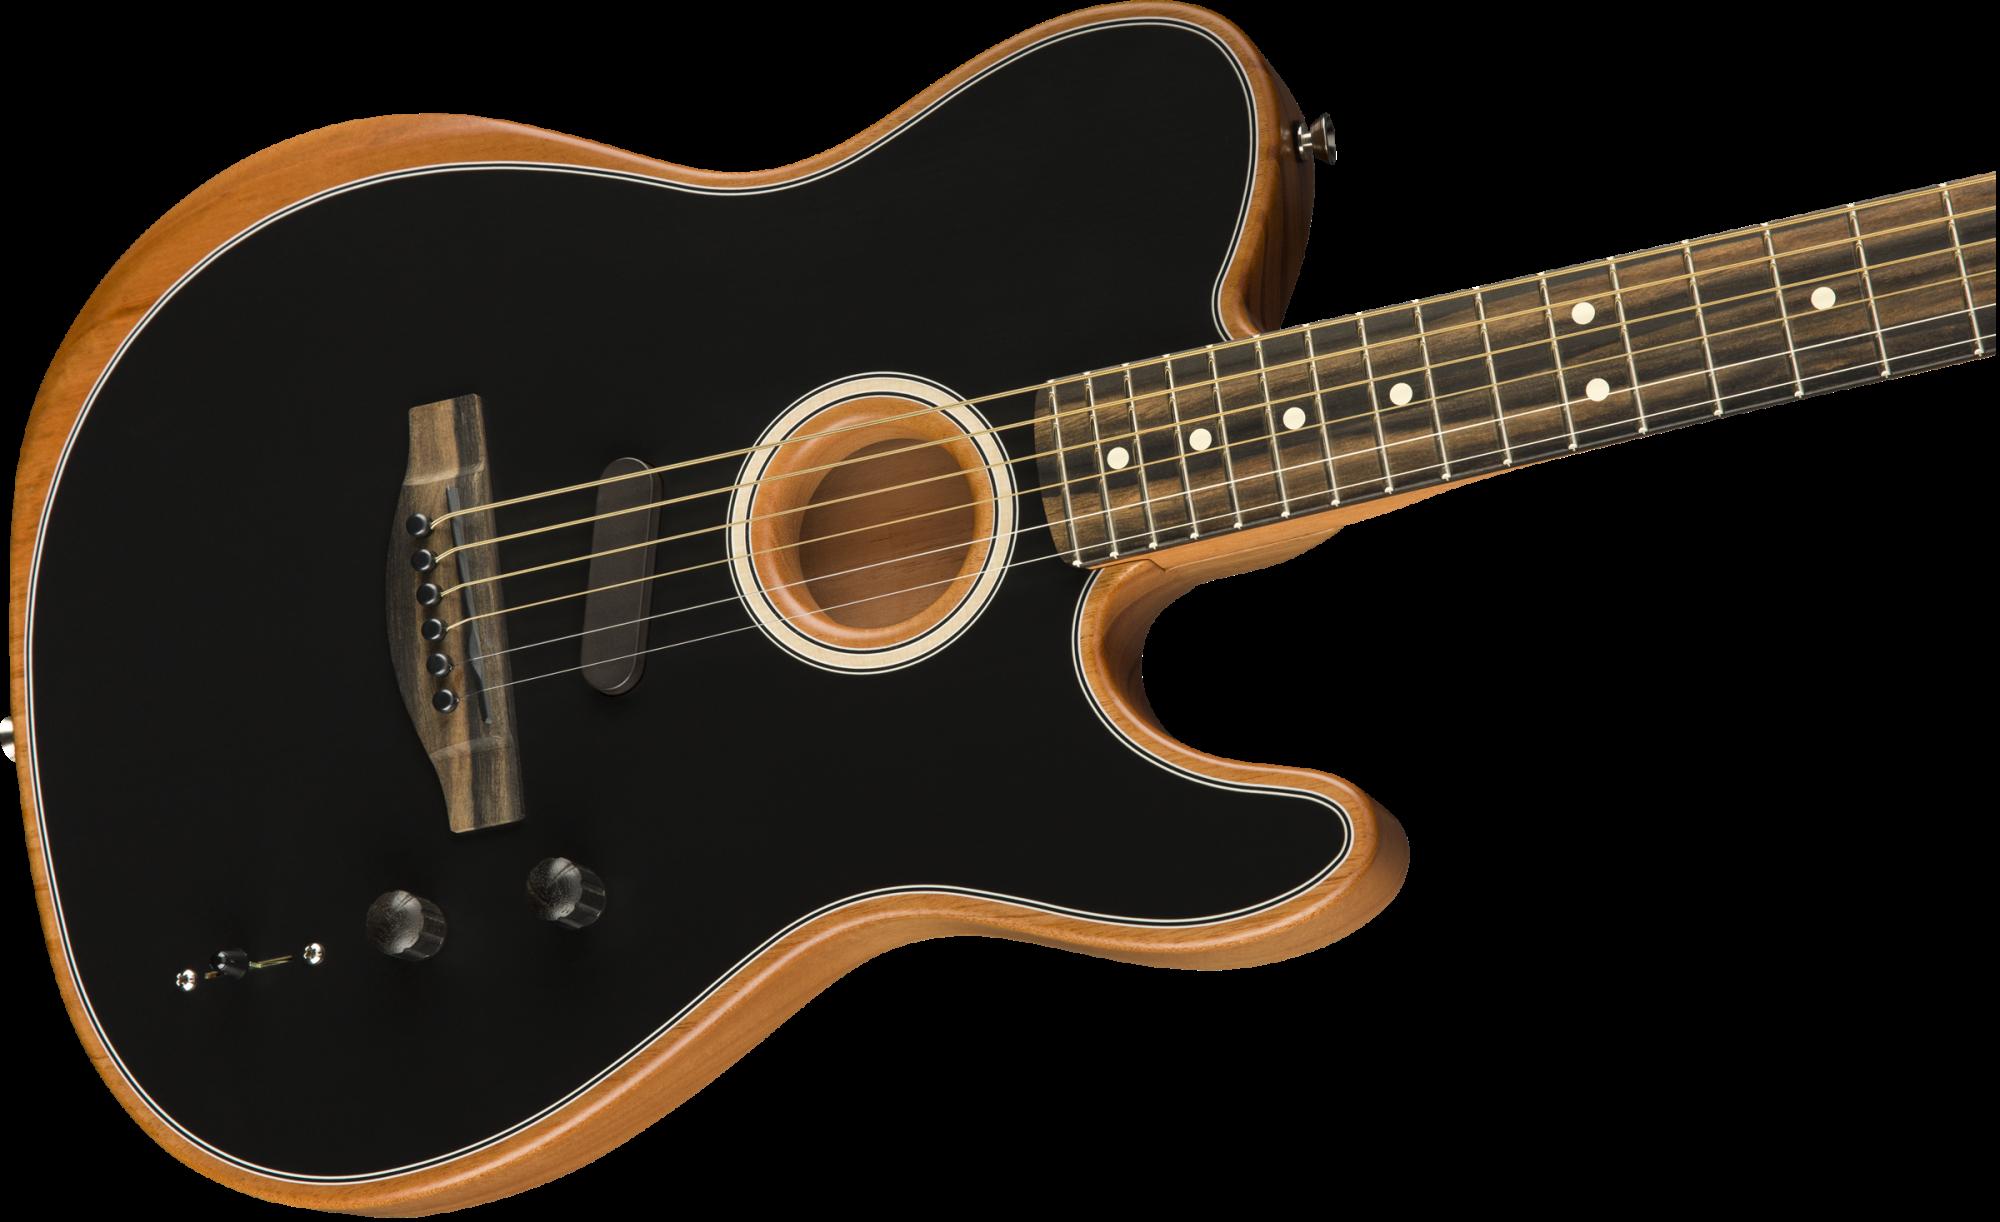 Fender American Acoustasonic Telecaster Ebony Fingerboard - Black